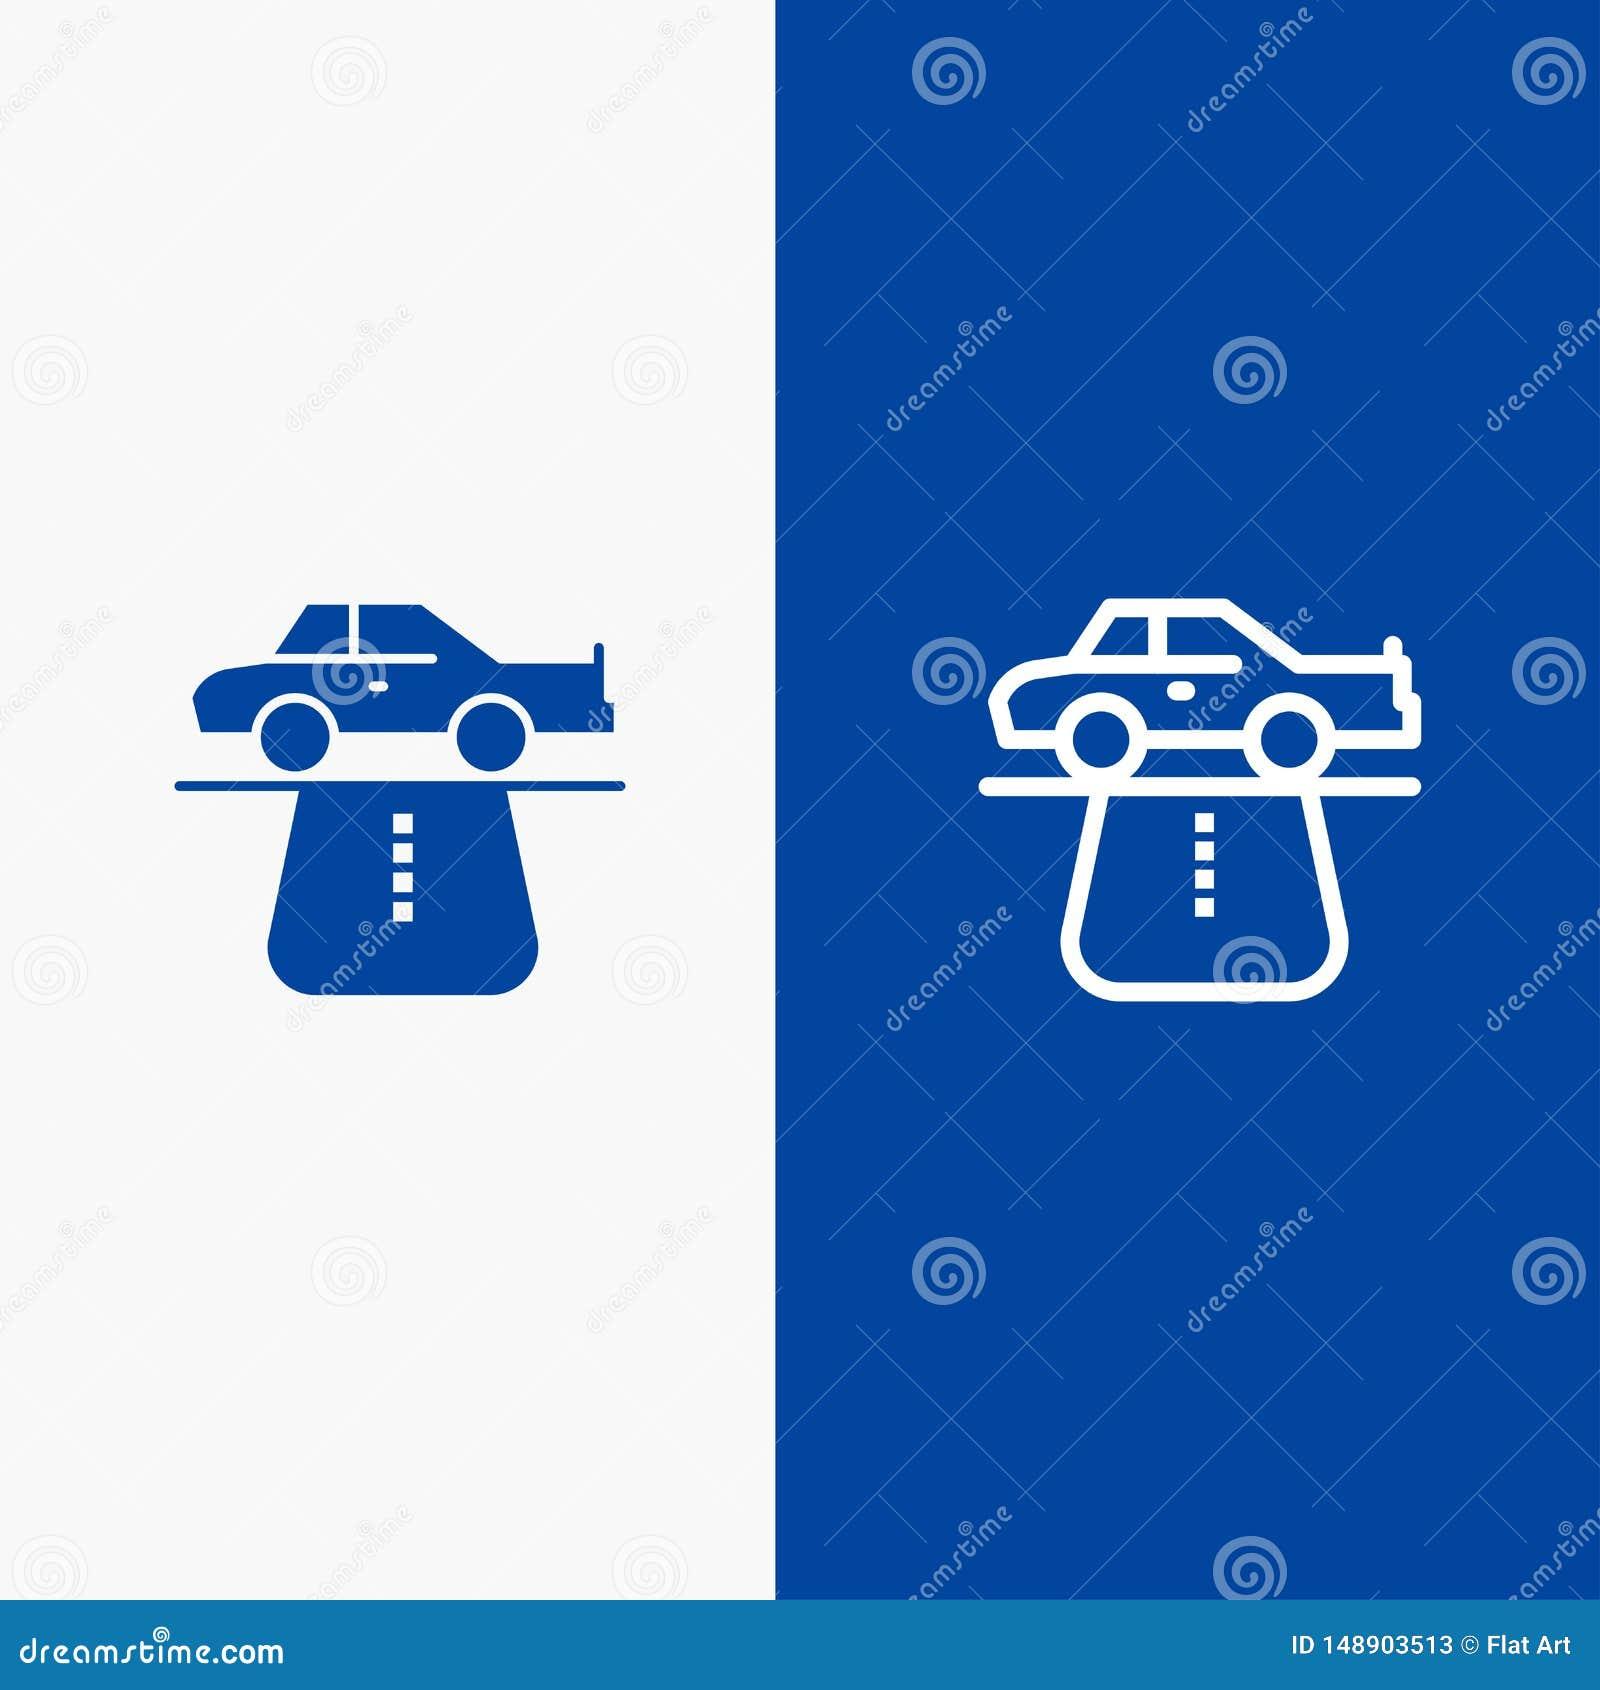 Значка линии и глифа знамени твердого значка преимущества, власти, автомобиля, ковра, линии комфорта и глифа знамя голубого тверд